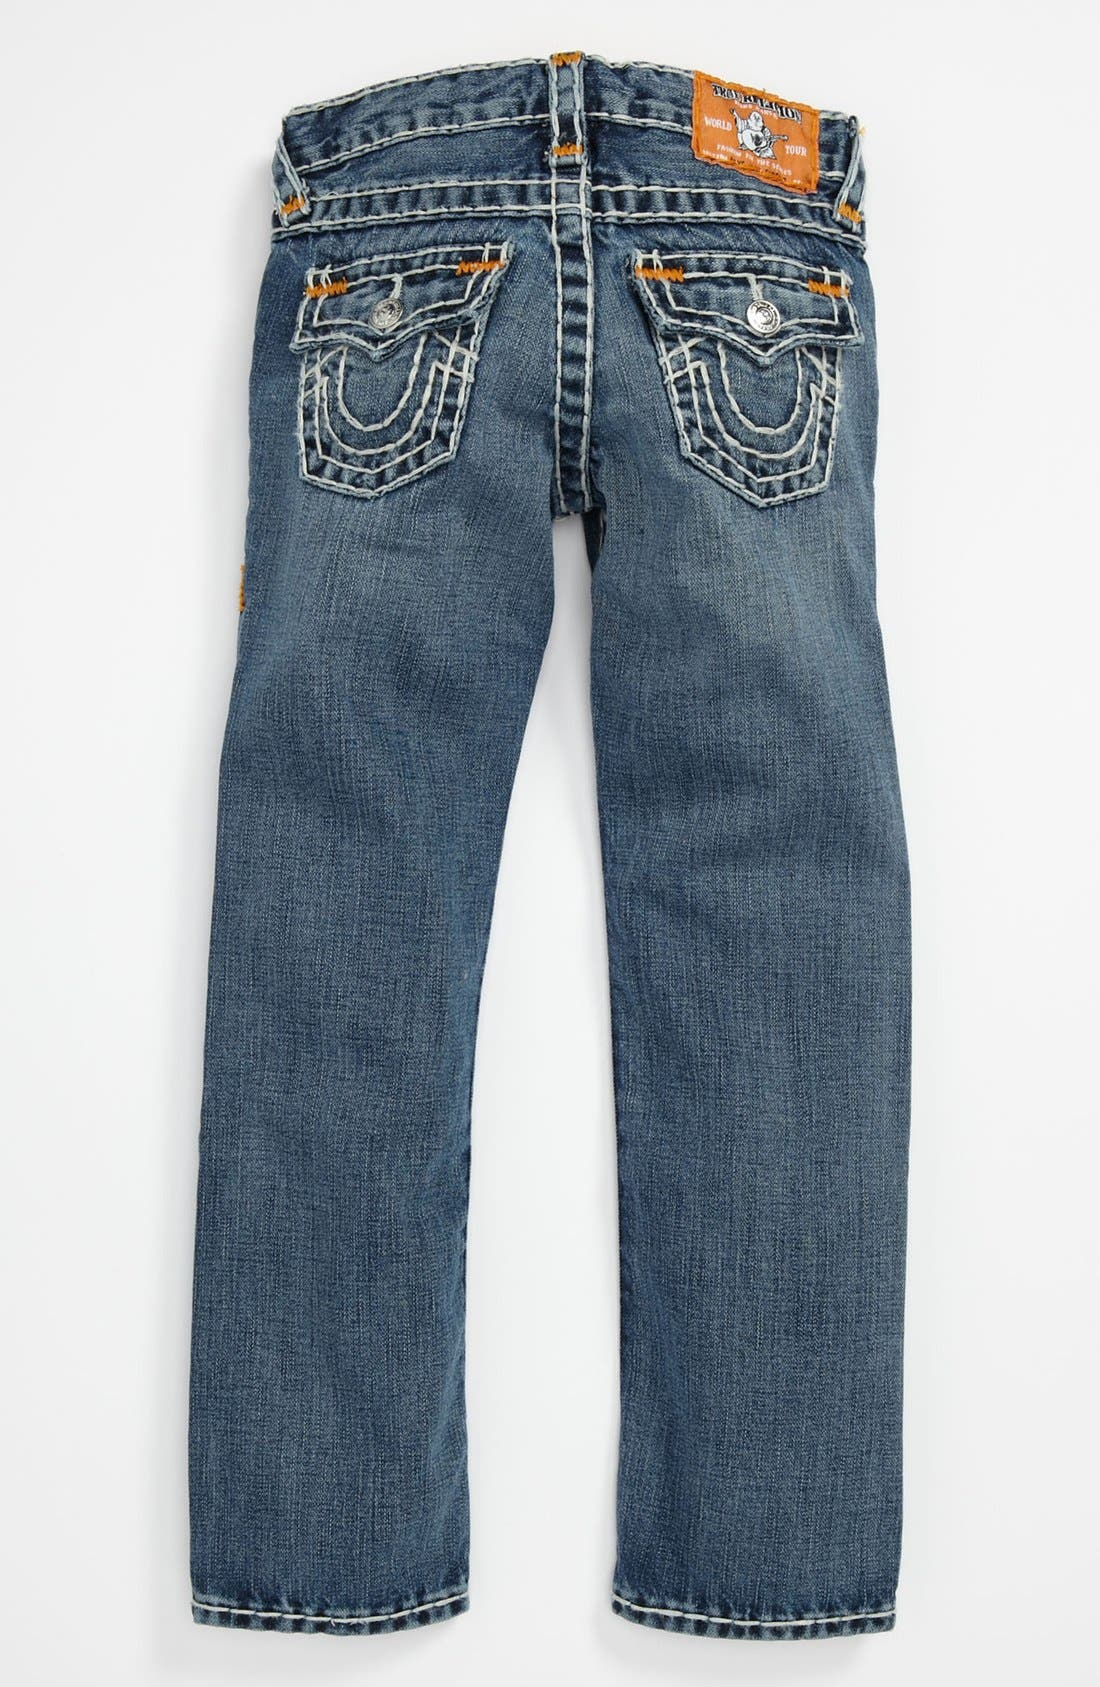 Alternate Image 1 Selected - True Religion Brand Jeans 'Jack Super T' Straight Leg Jeans (Little Boys & Big Boys)